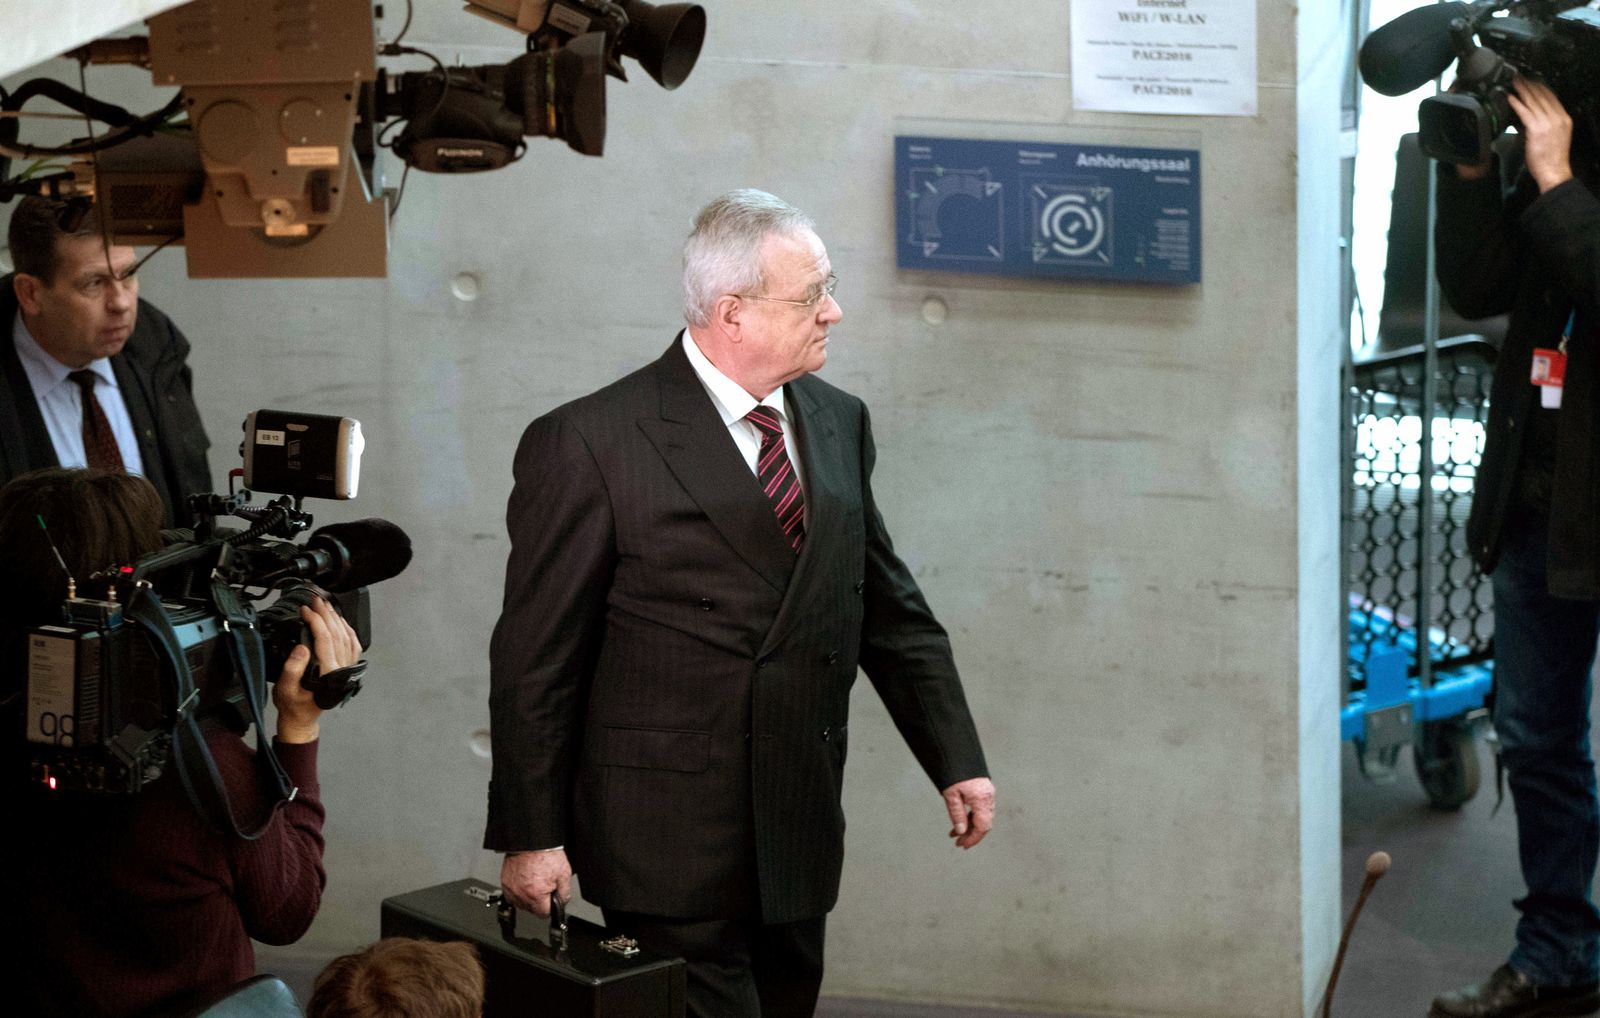 Martin Winterkorn / Bundestag